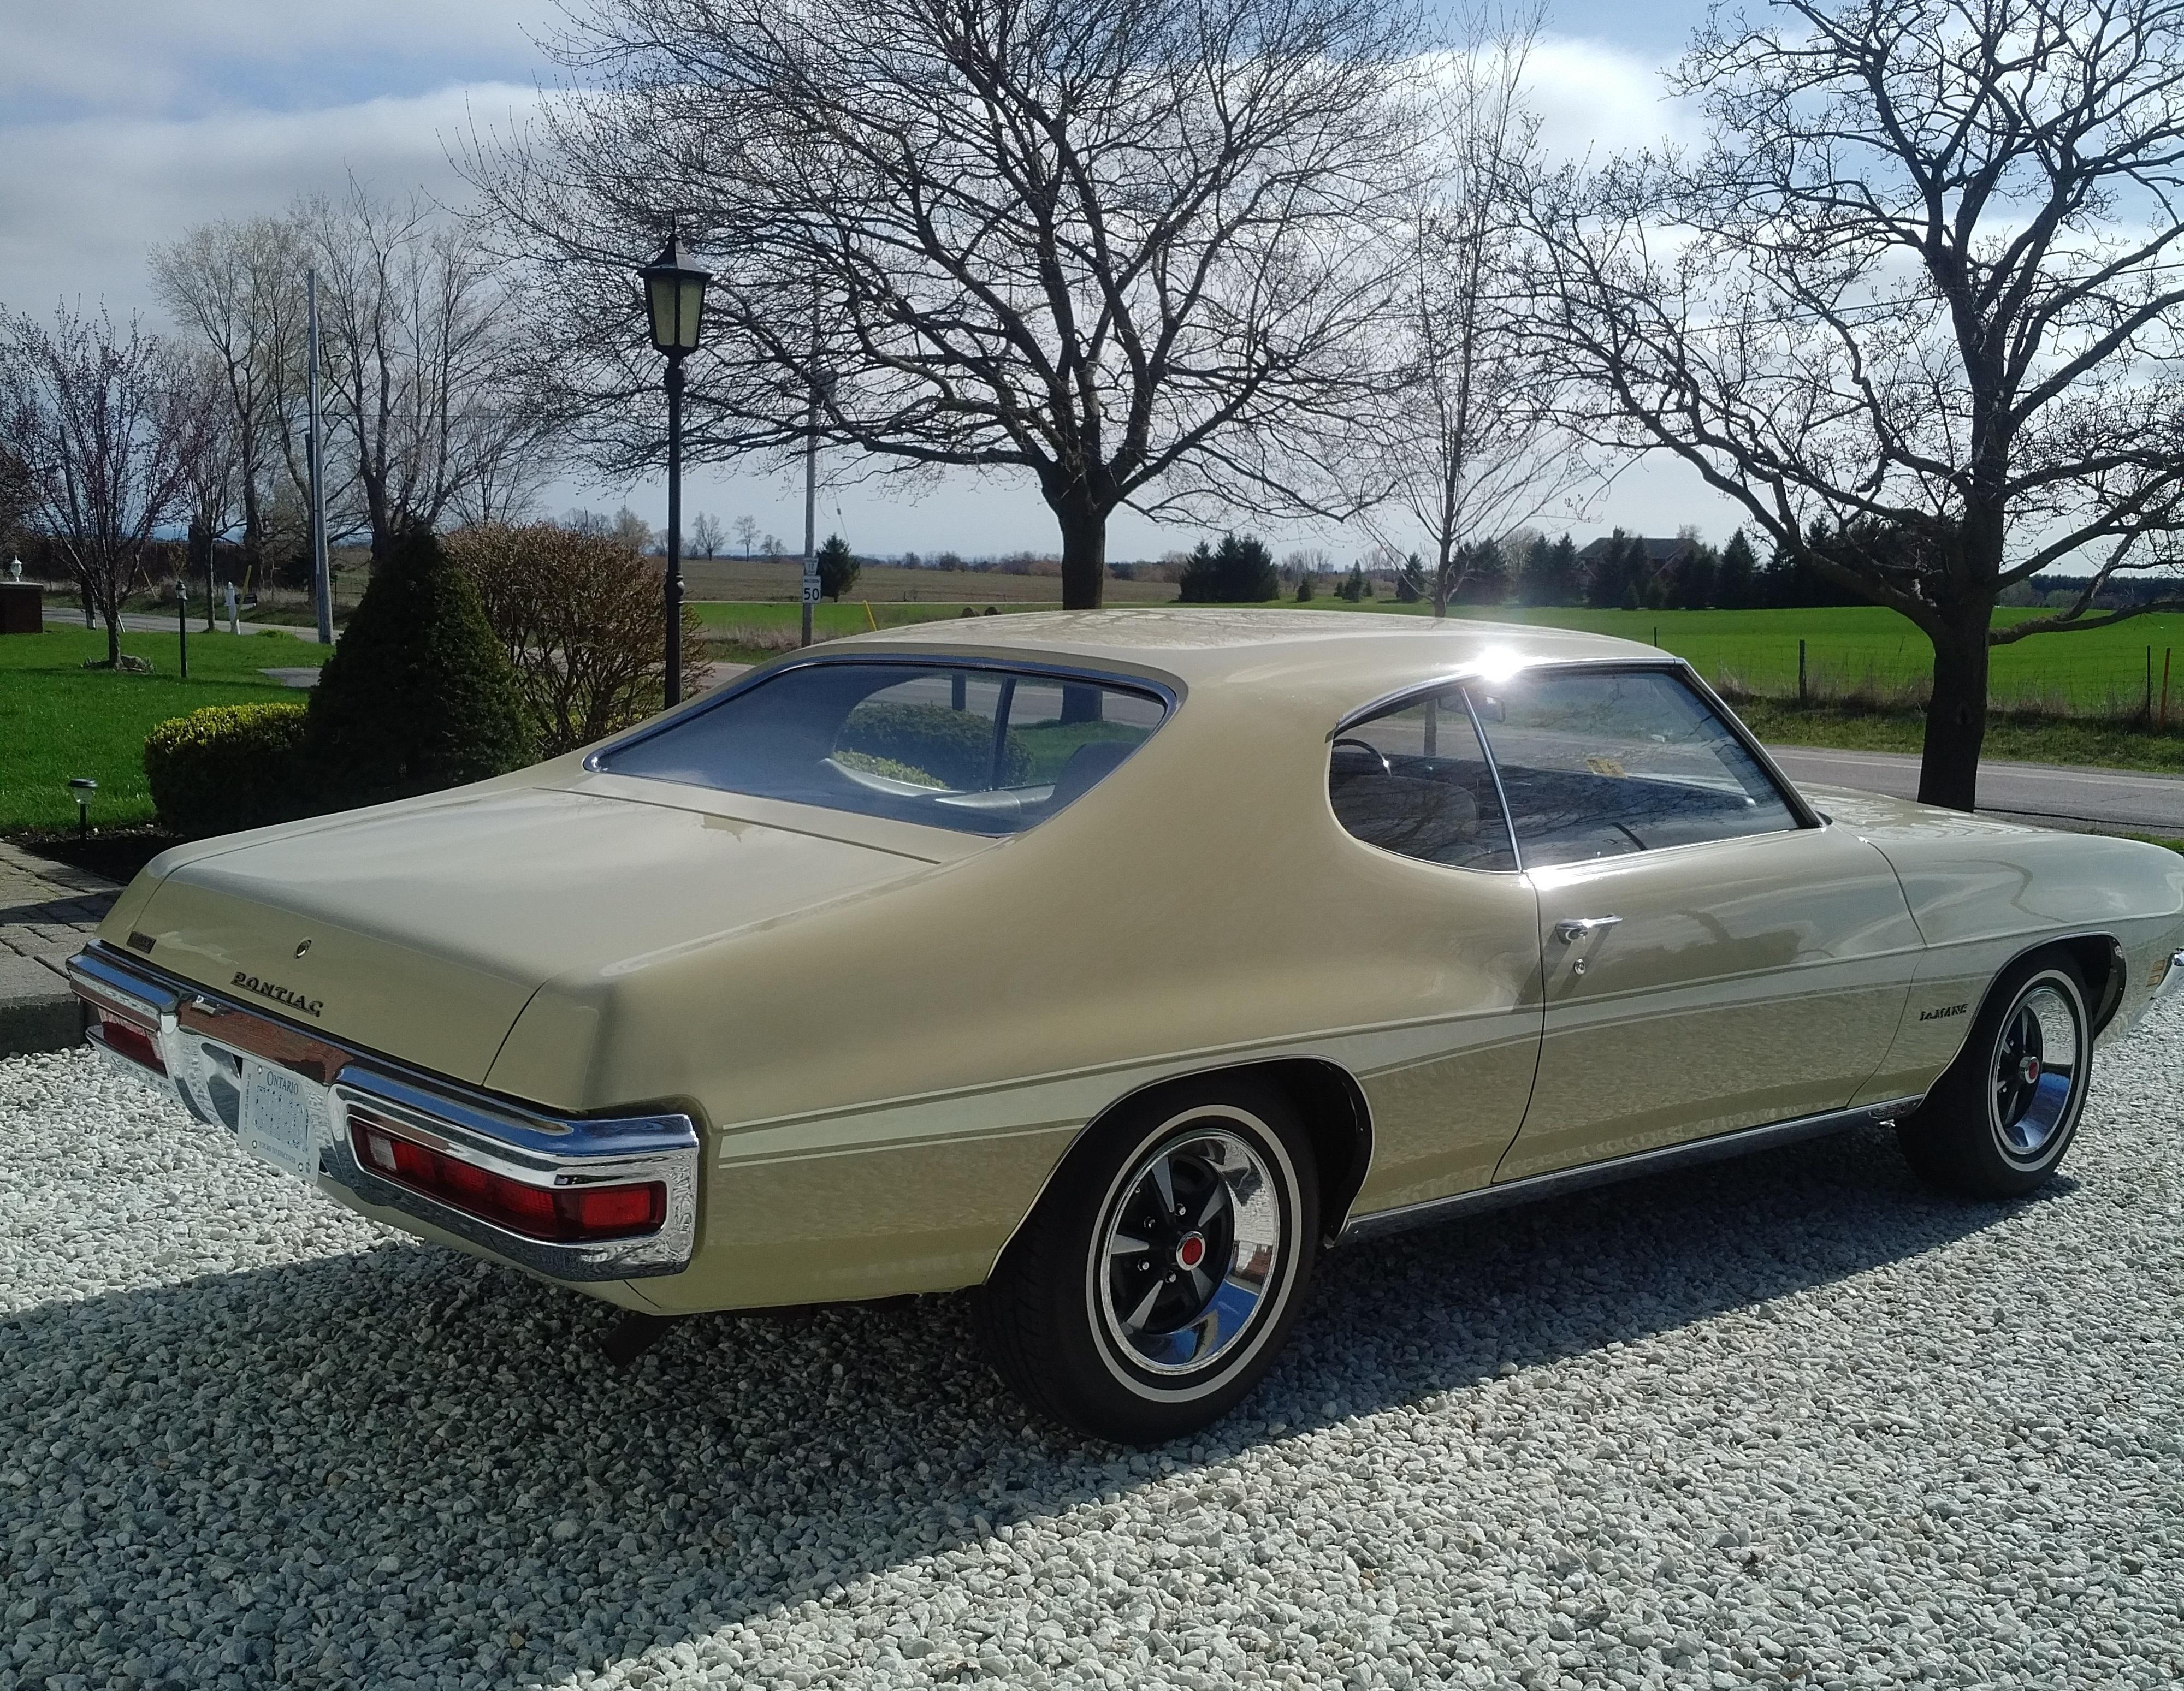 For Sale Immaculate Virginia Survivor, 1972 Pontiac Le Mans 2 door ...